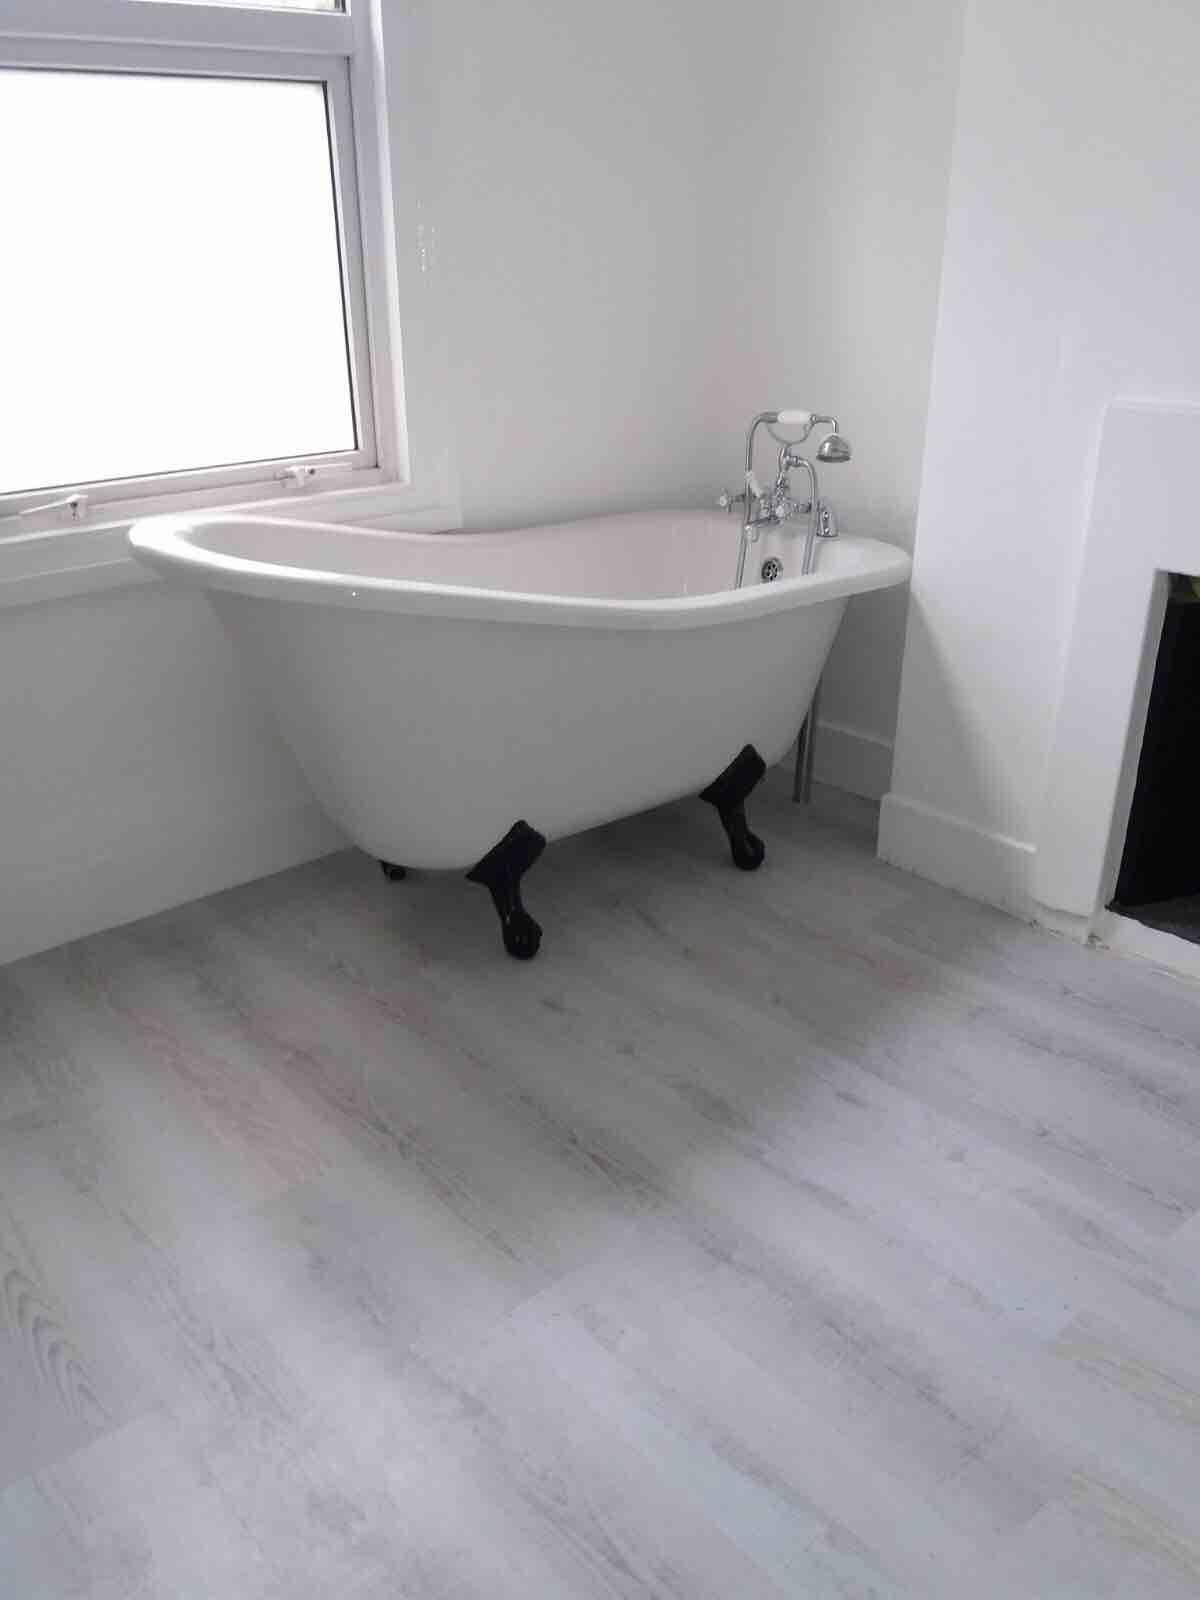 Fitting Of Luxury Vinyl Tiles Lvt In Bathroom Area For Preparation